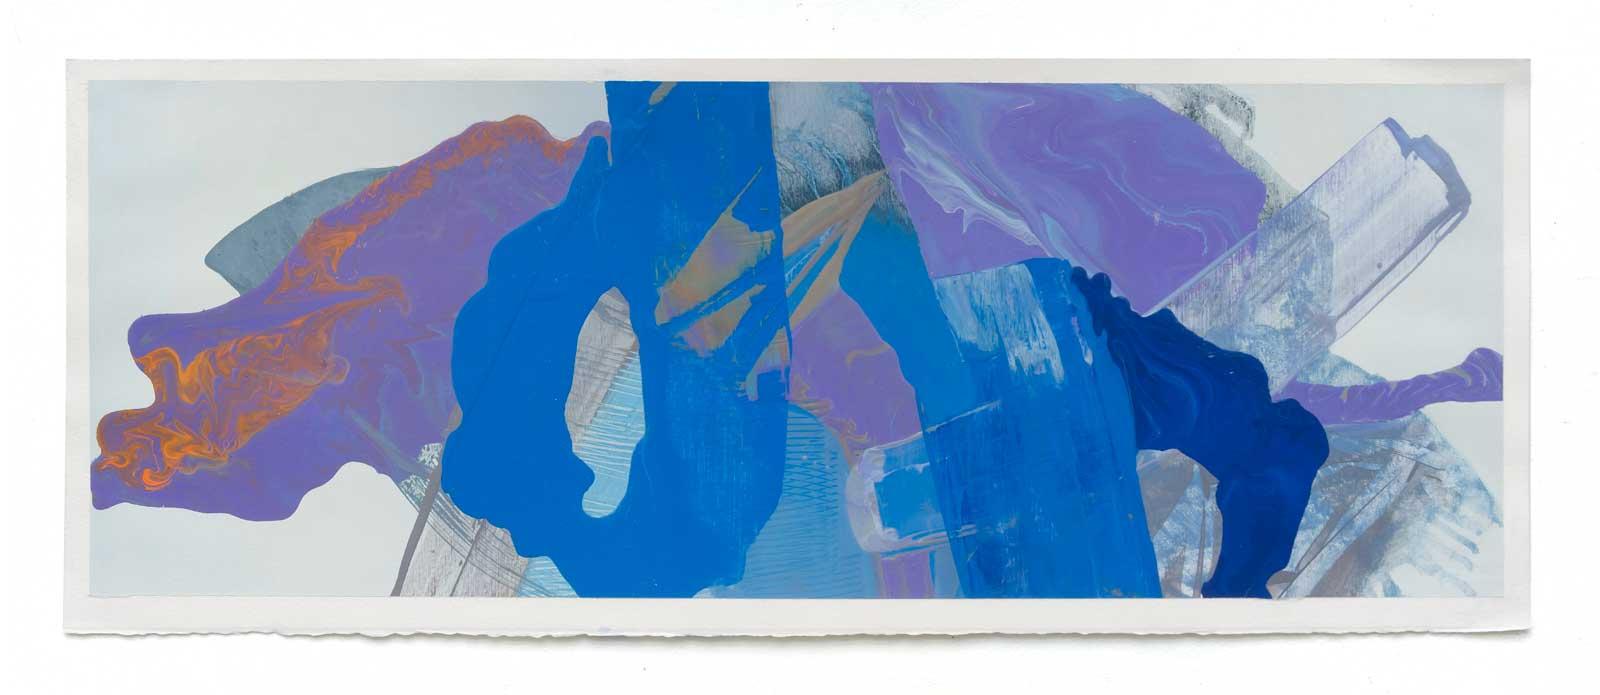 Disruptions-7-oil-on-paper-25.4 cm x 71.12 cm.